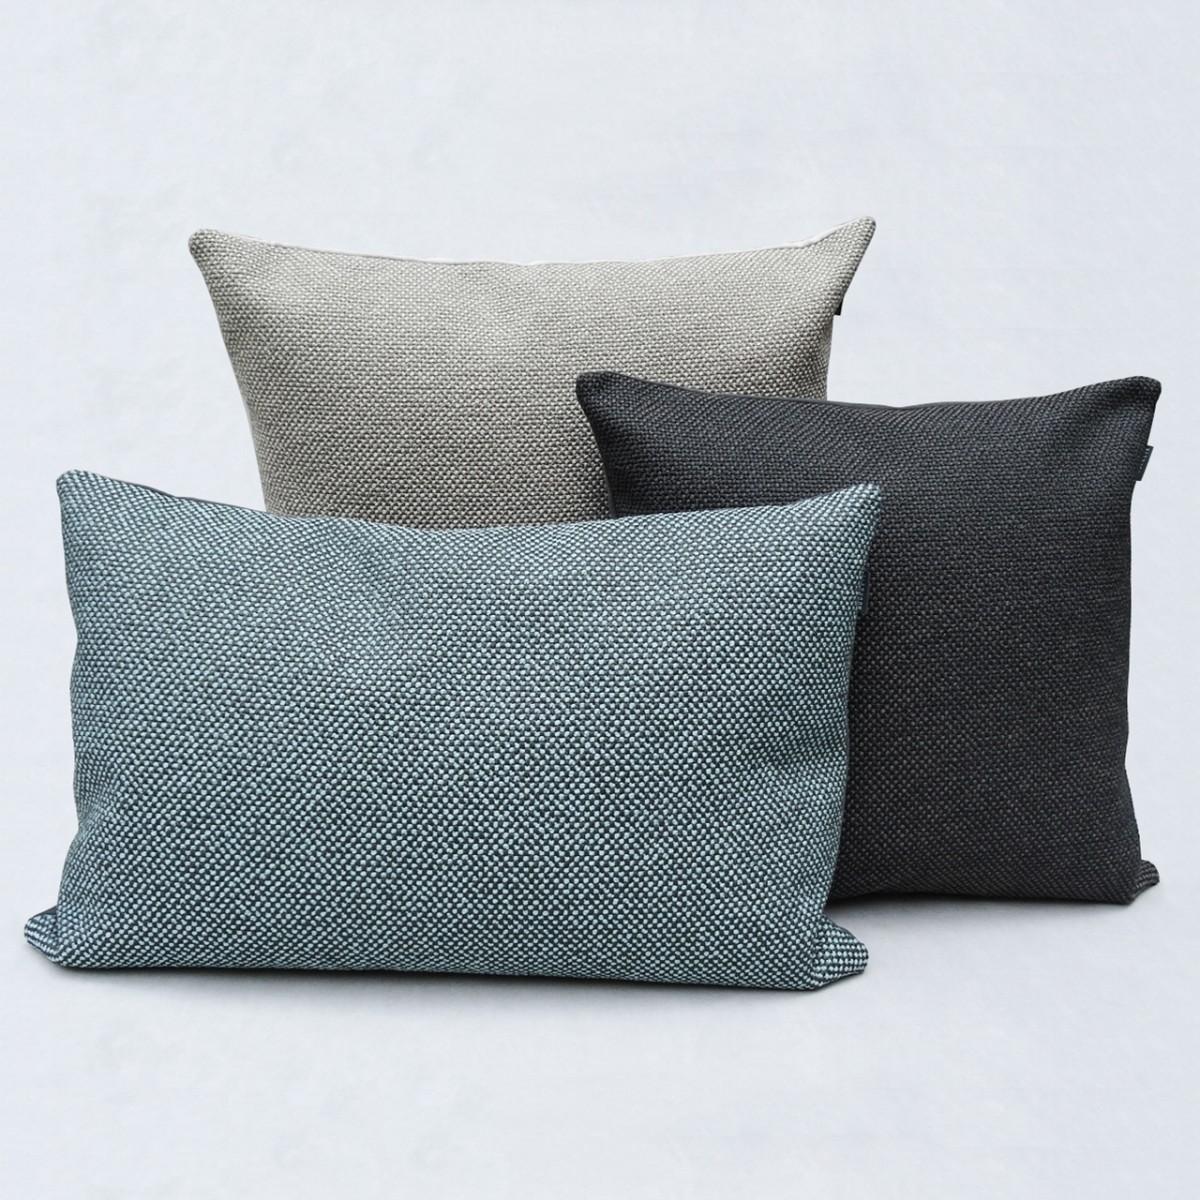 hook eye kissen 39 fat bo 39 50x50 in zehn farben. Black Bedroom Furniture Sets. Home Design Ideas